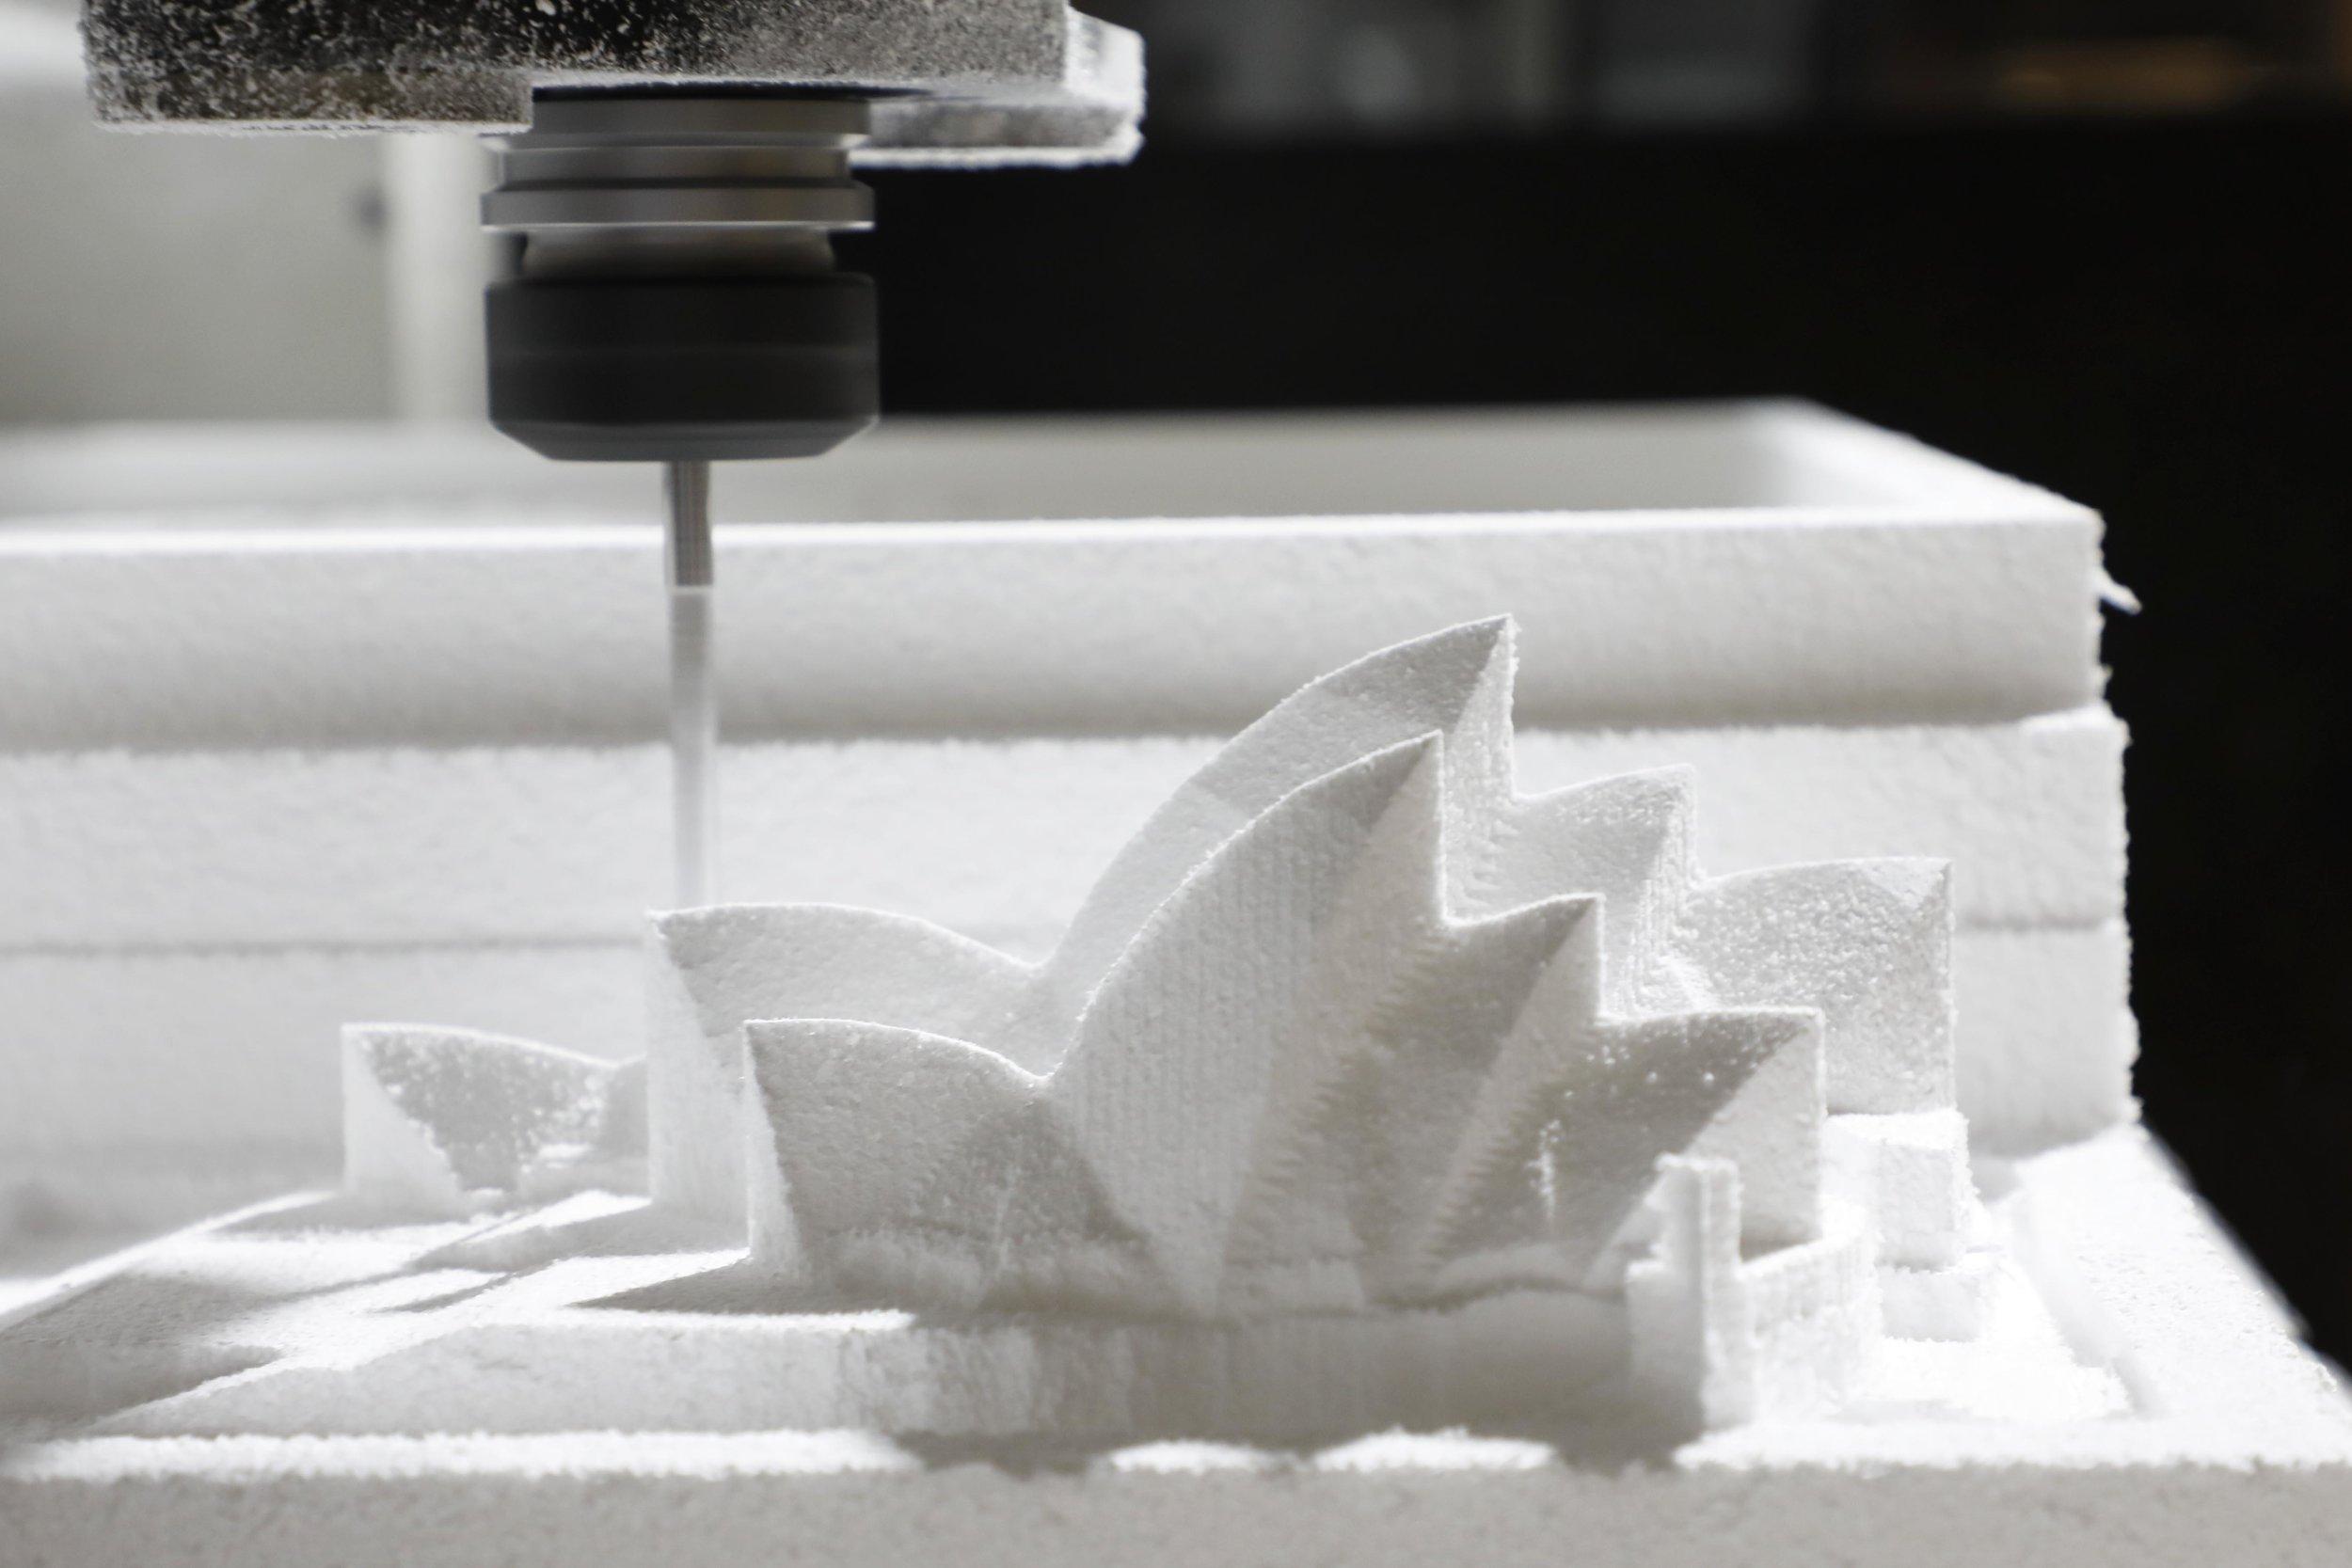 make_models_cnc_fabrication_foam_sydney_opera_house.jpg